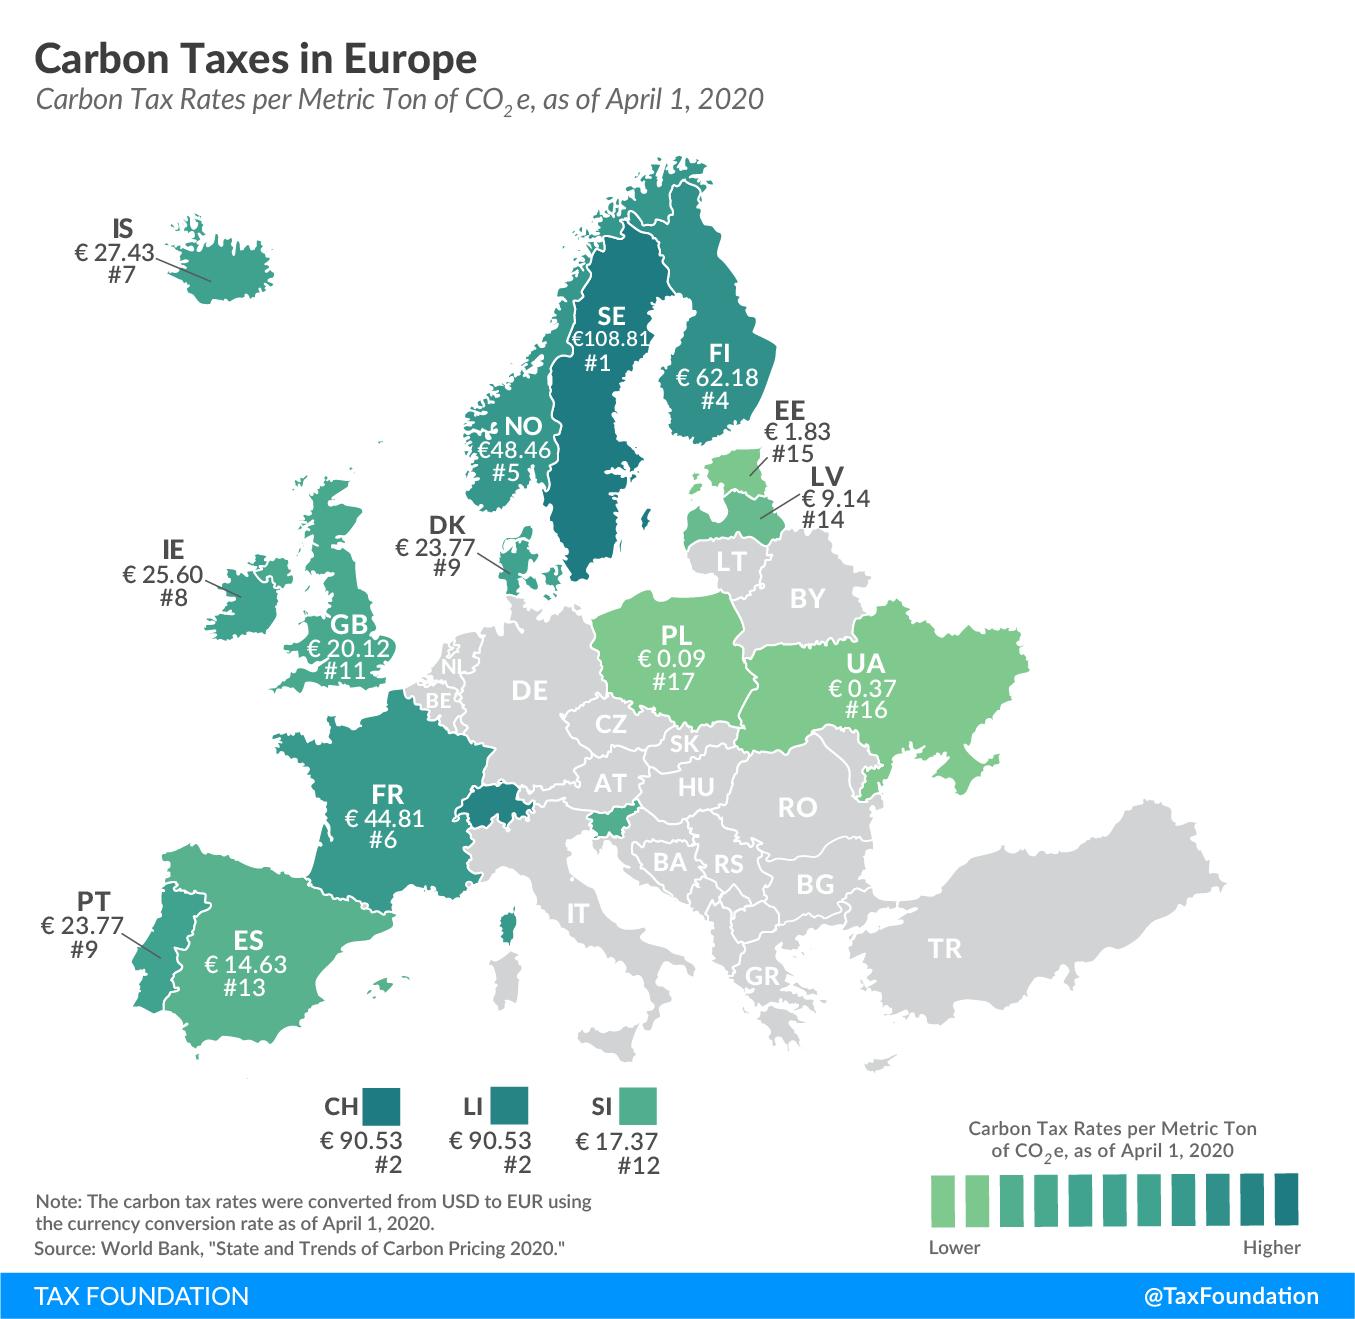 european countries with a carbon tax, carbon tax rates in Europe, carbon taxes in Europe